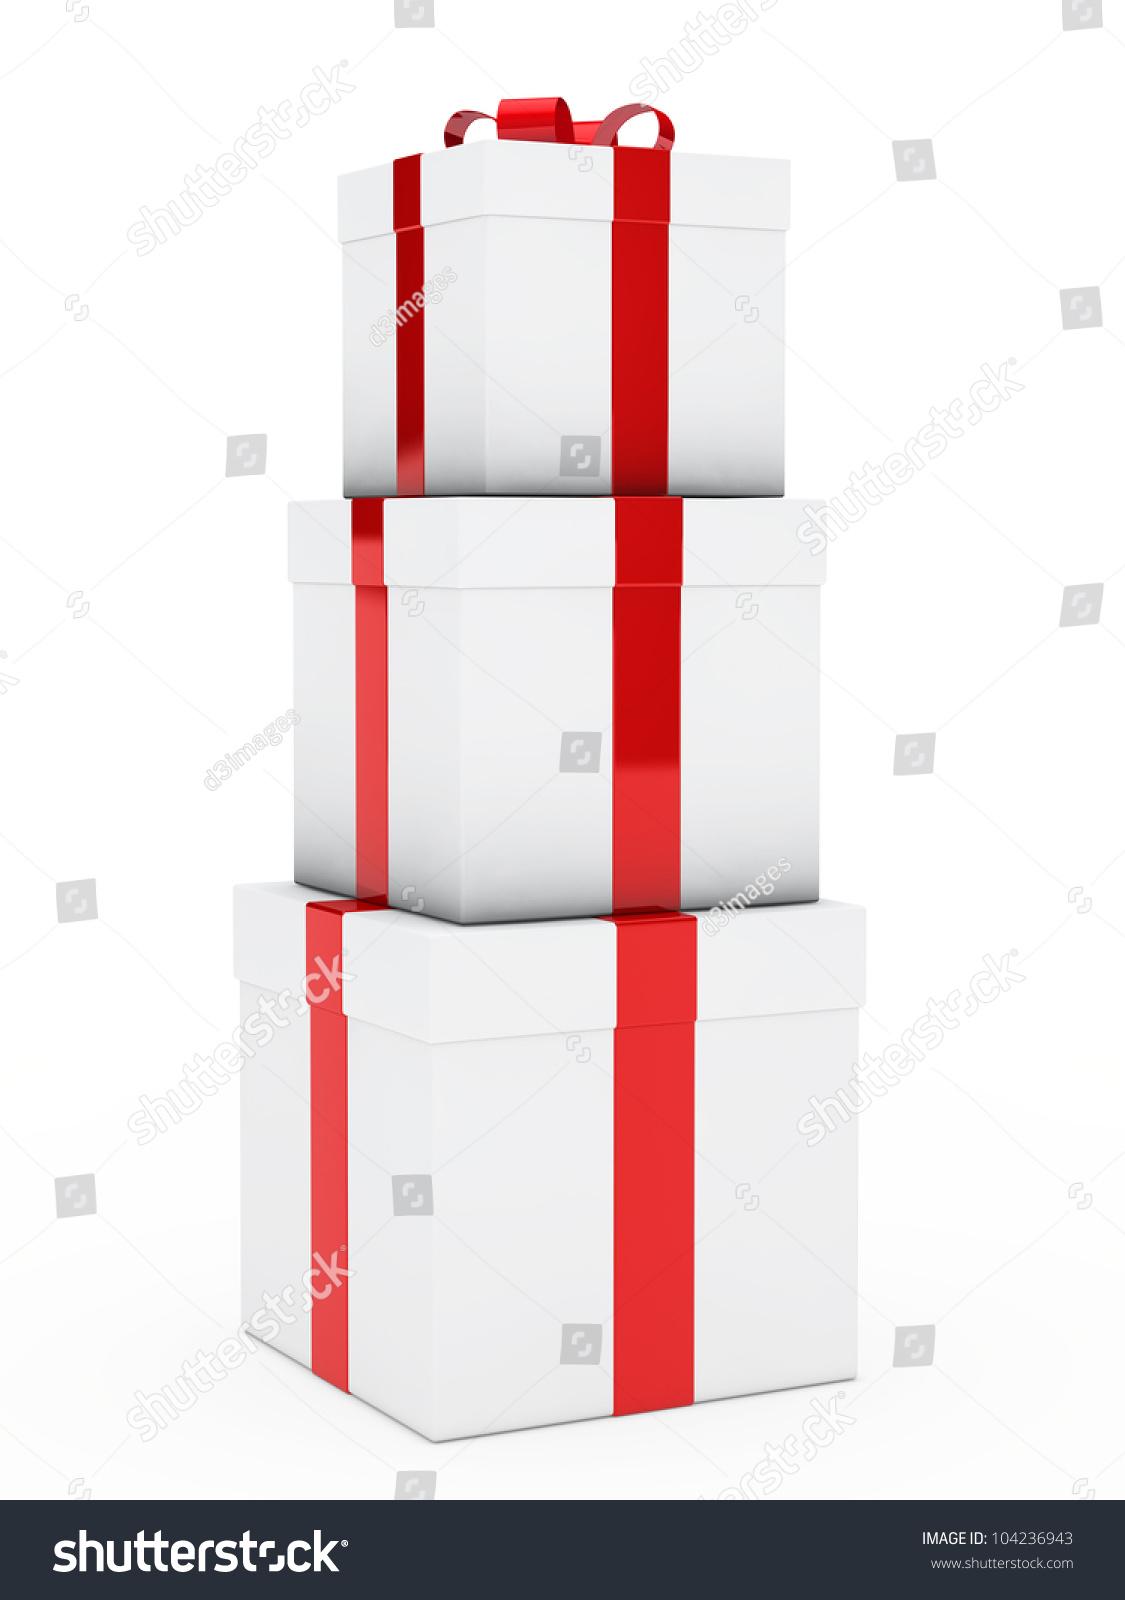 Christmas Three Gift Boxes Red White Stock Illustration 104236943 ...